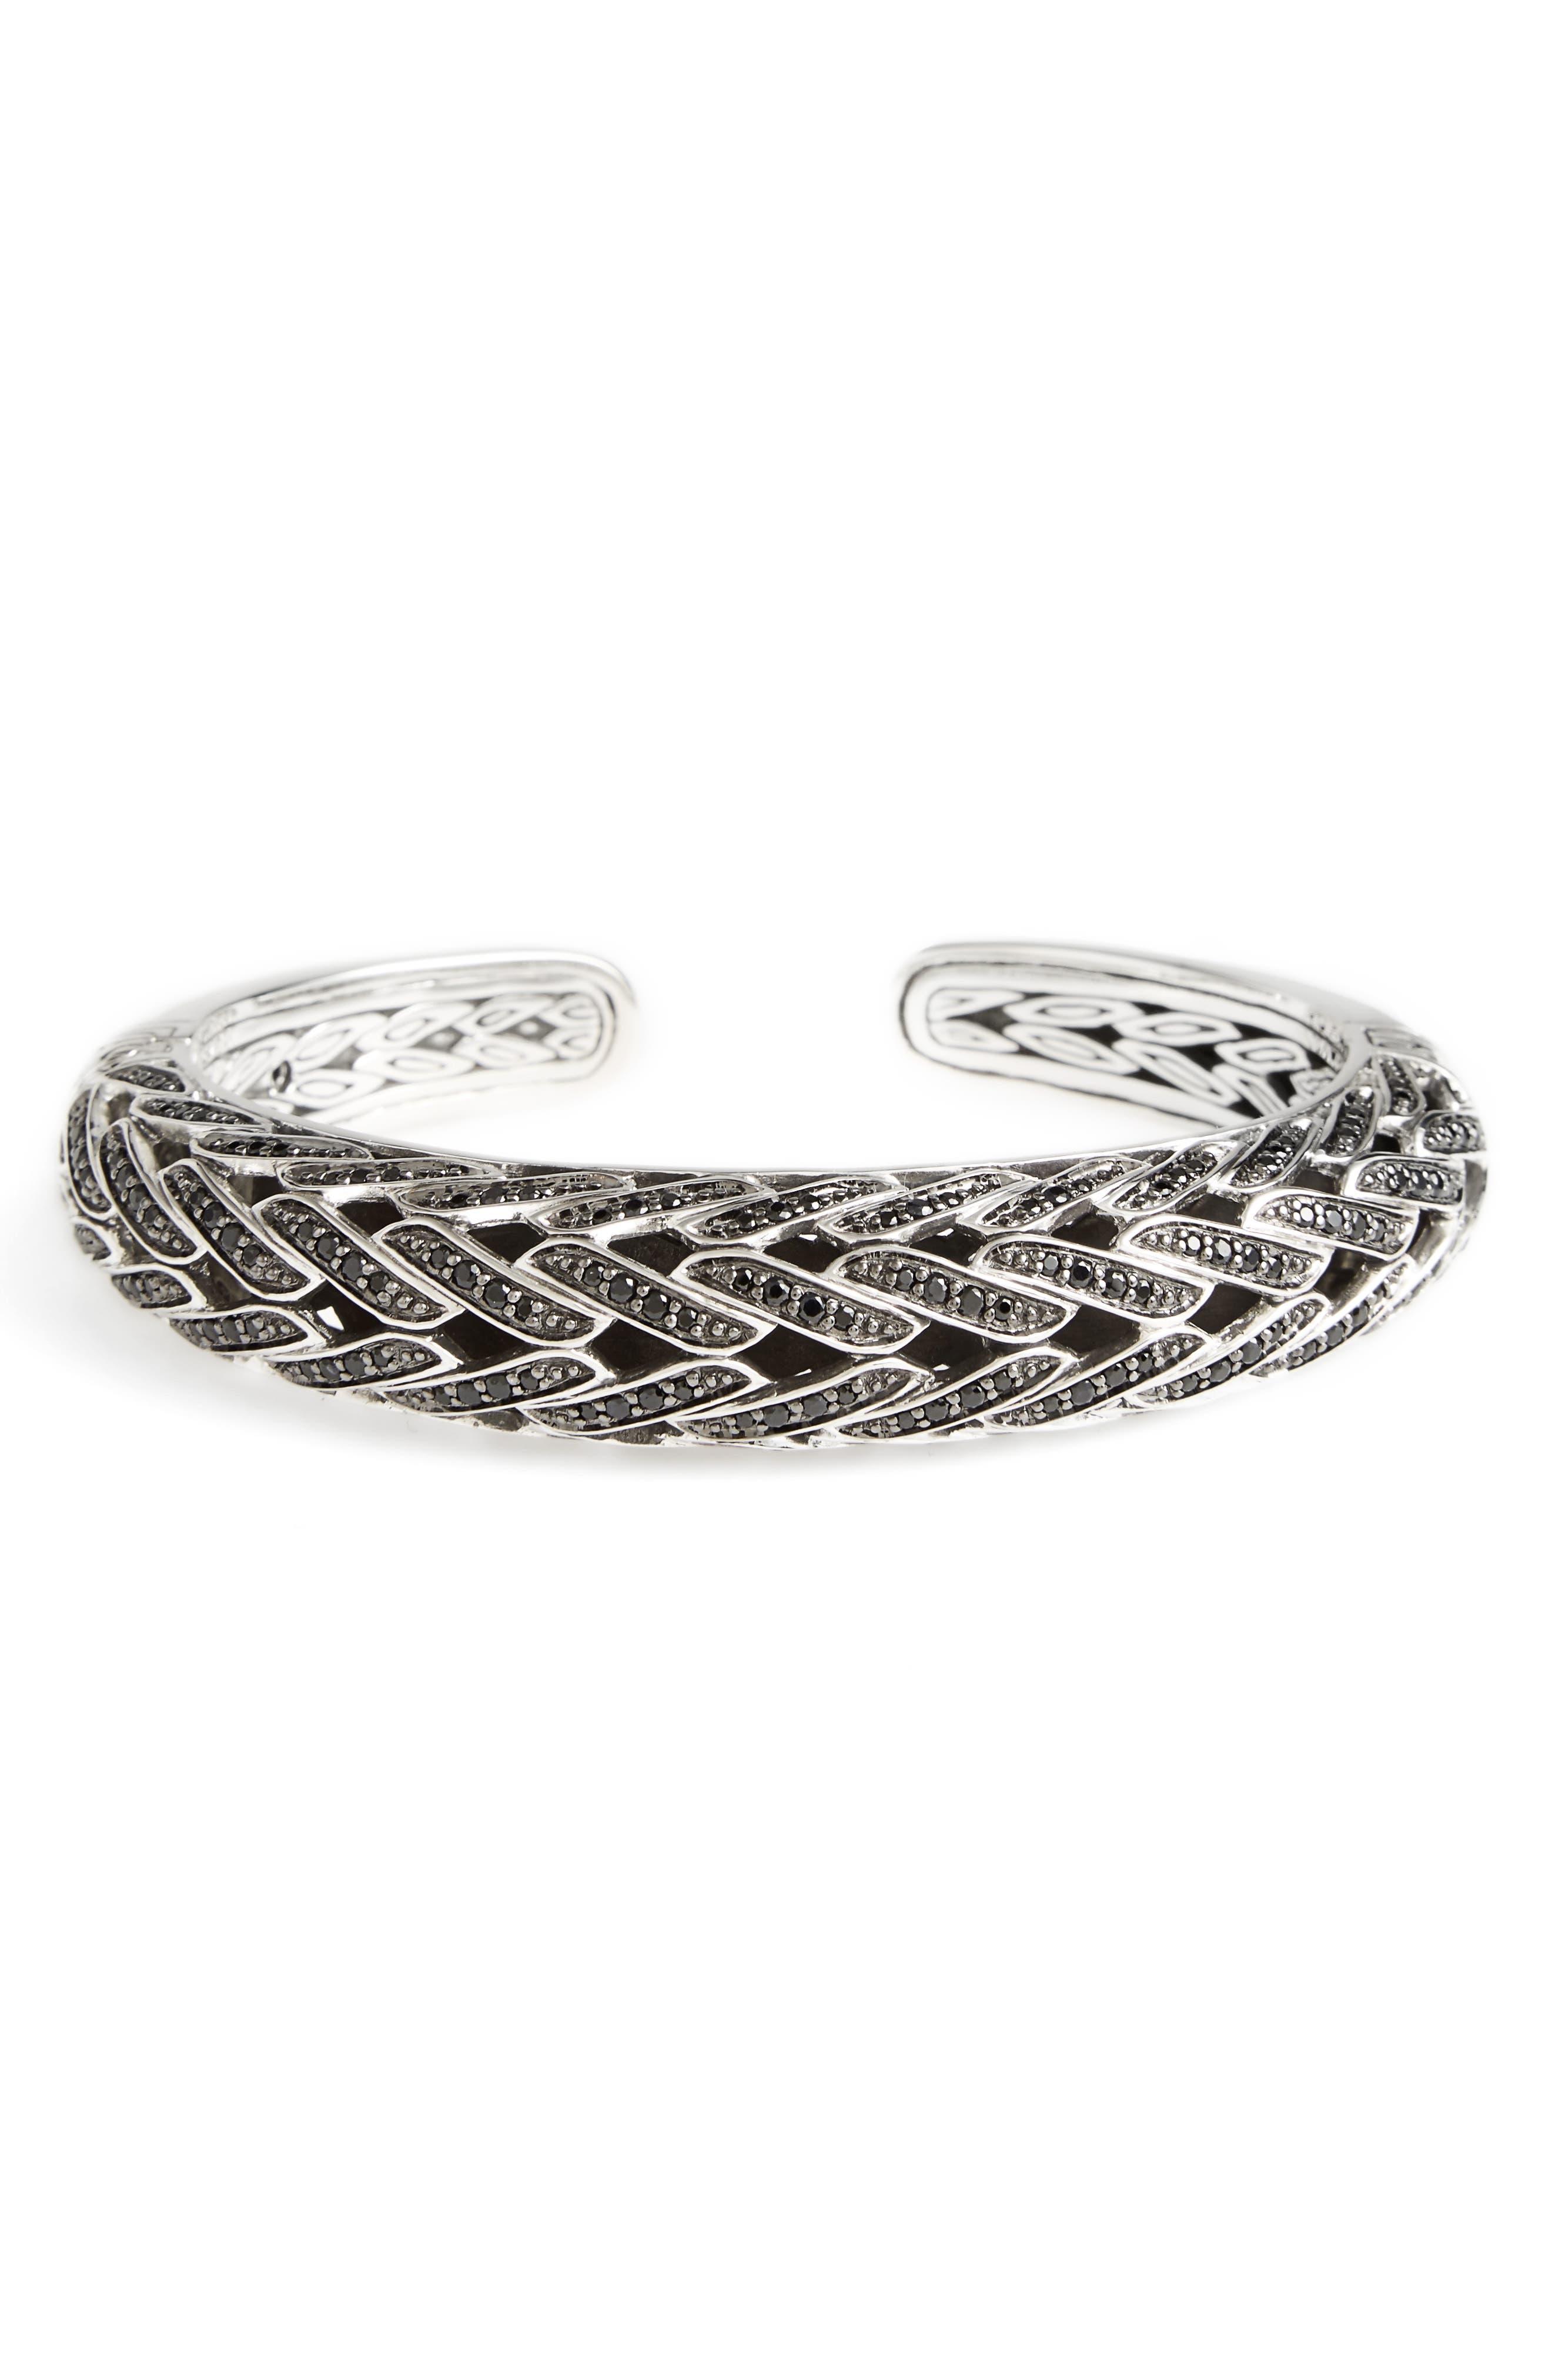 Classic Chain Spinel Bracelet,                             Main thumbnail 1, color,                             Silver/ Black Sapphire